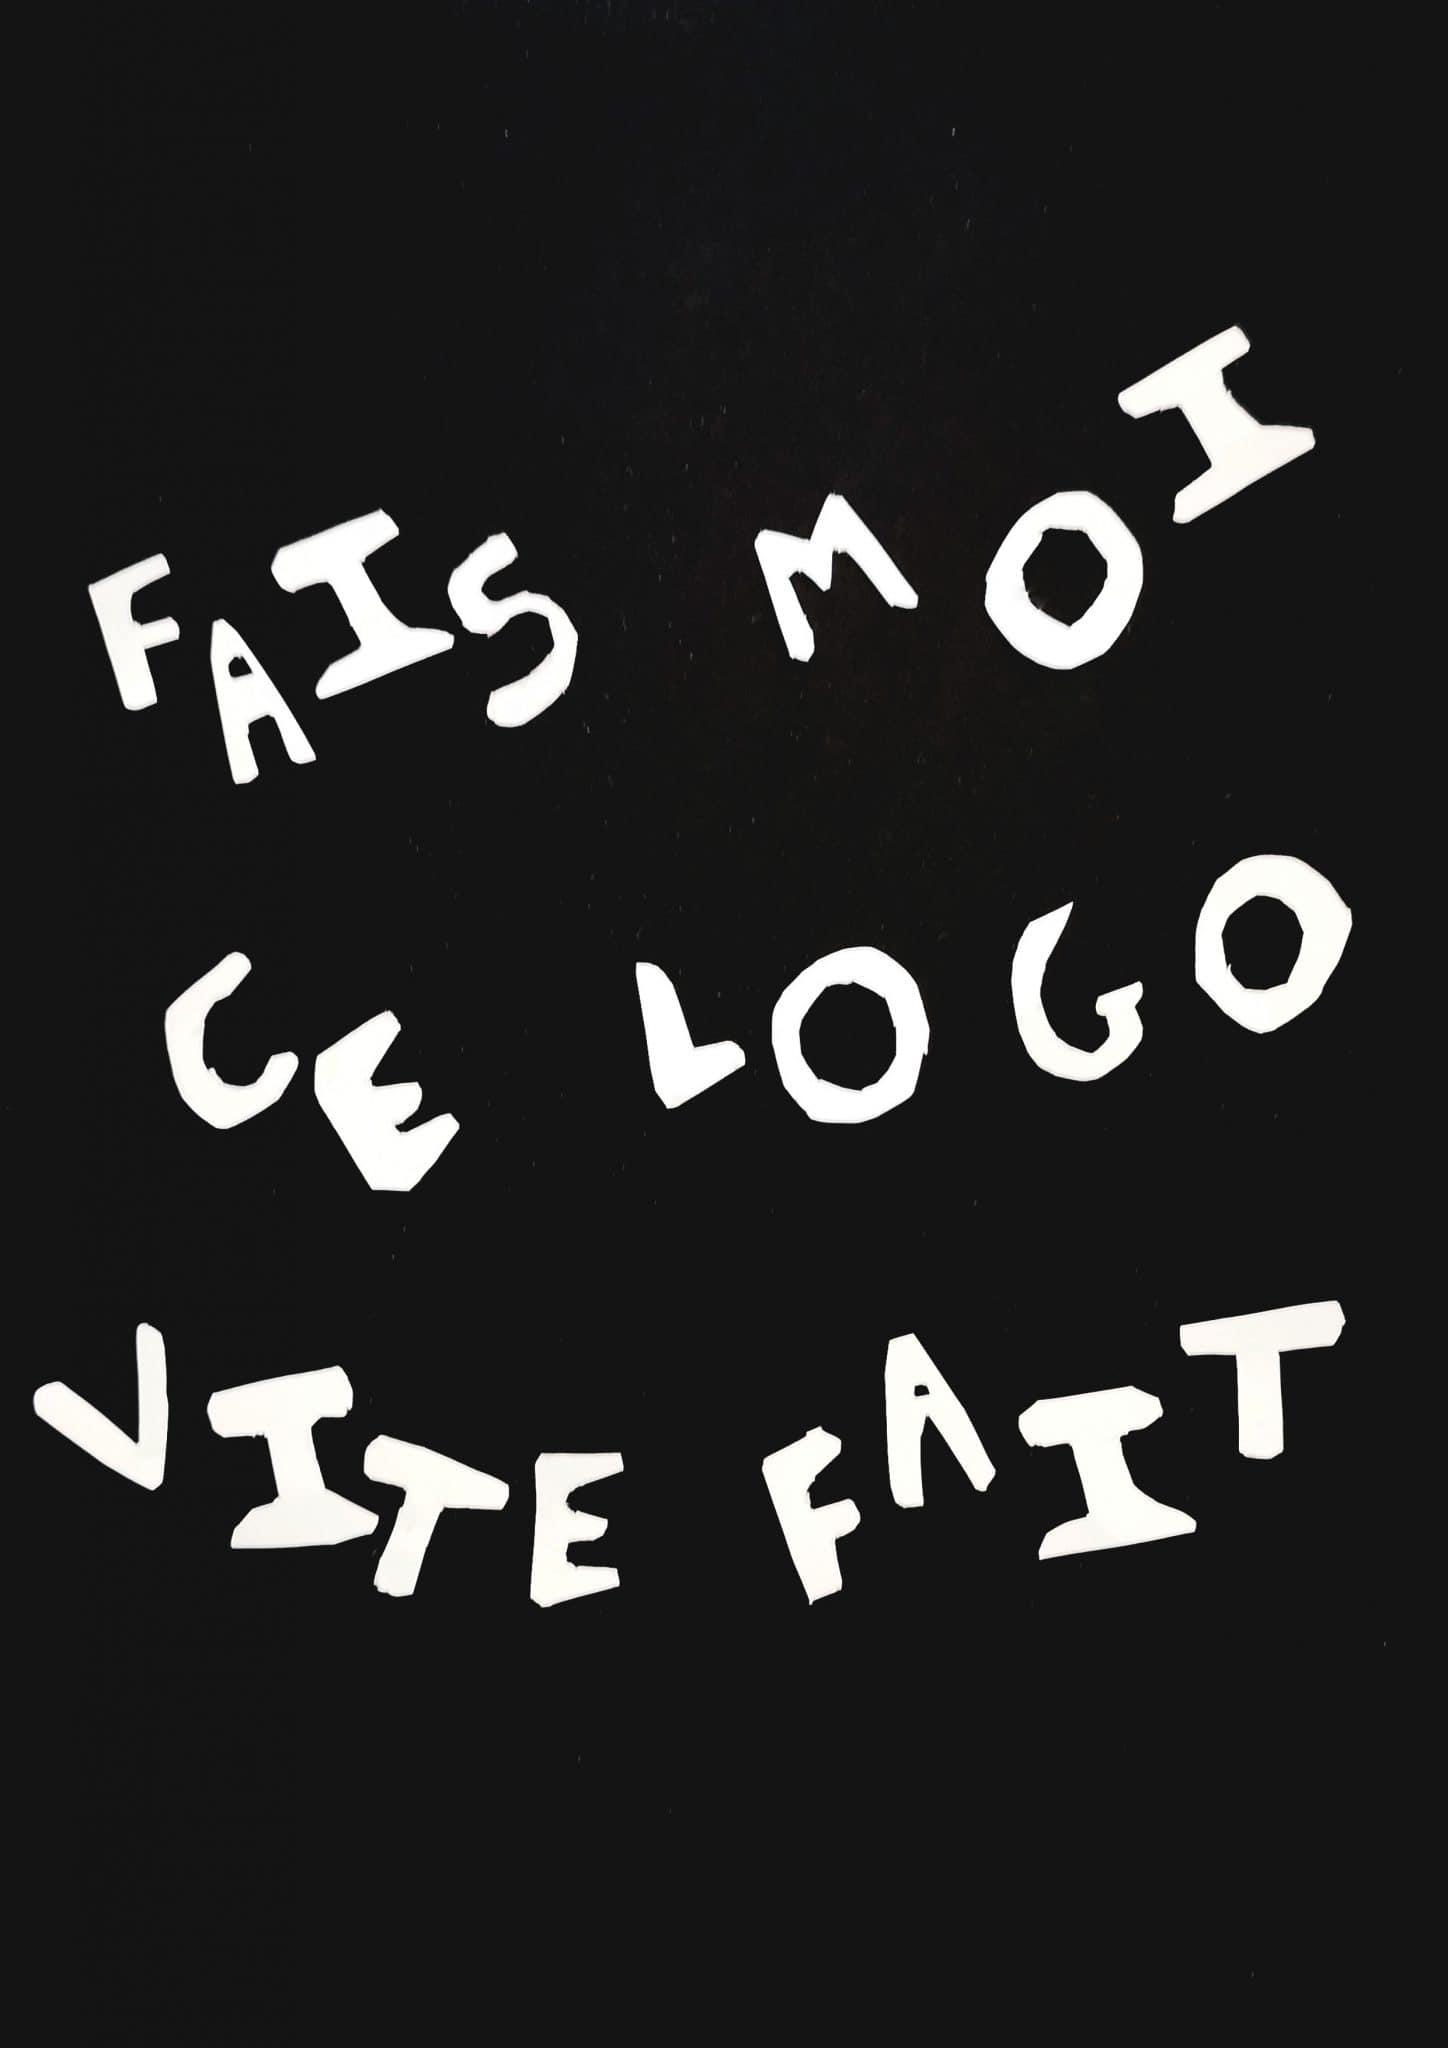 fais moi ce logo vitge fait_Caroline Santarelli